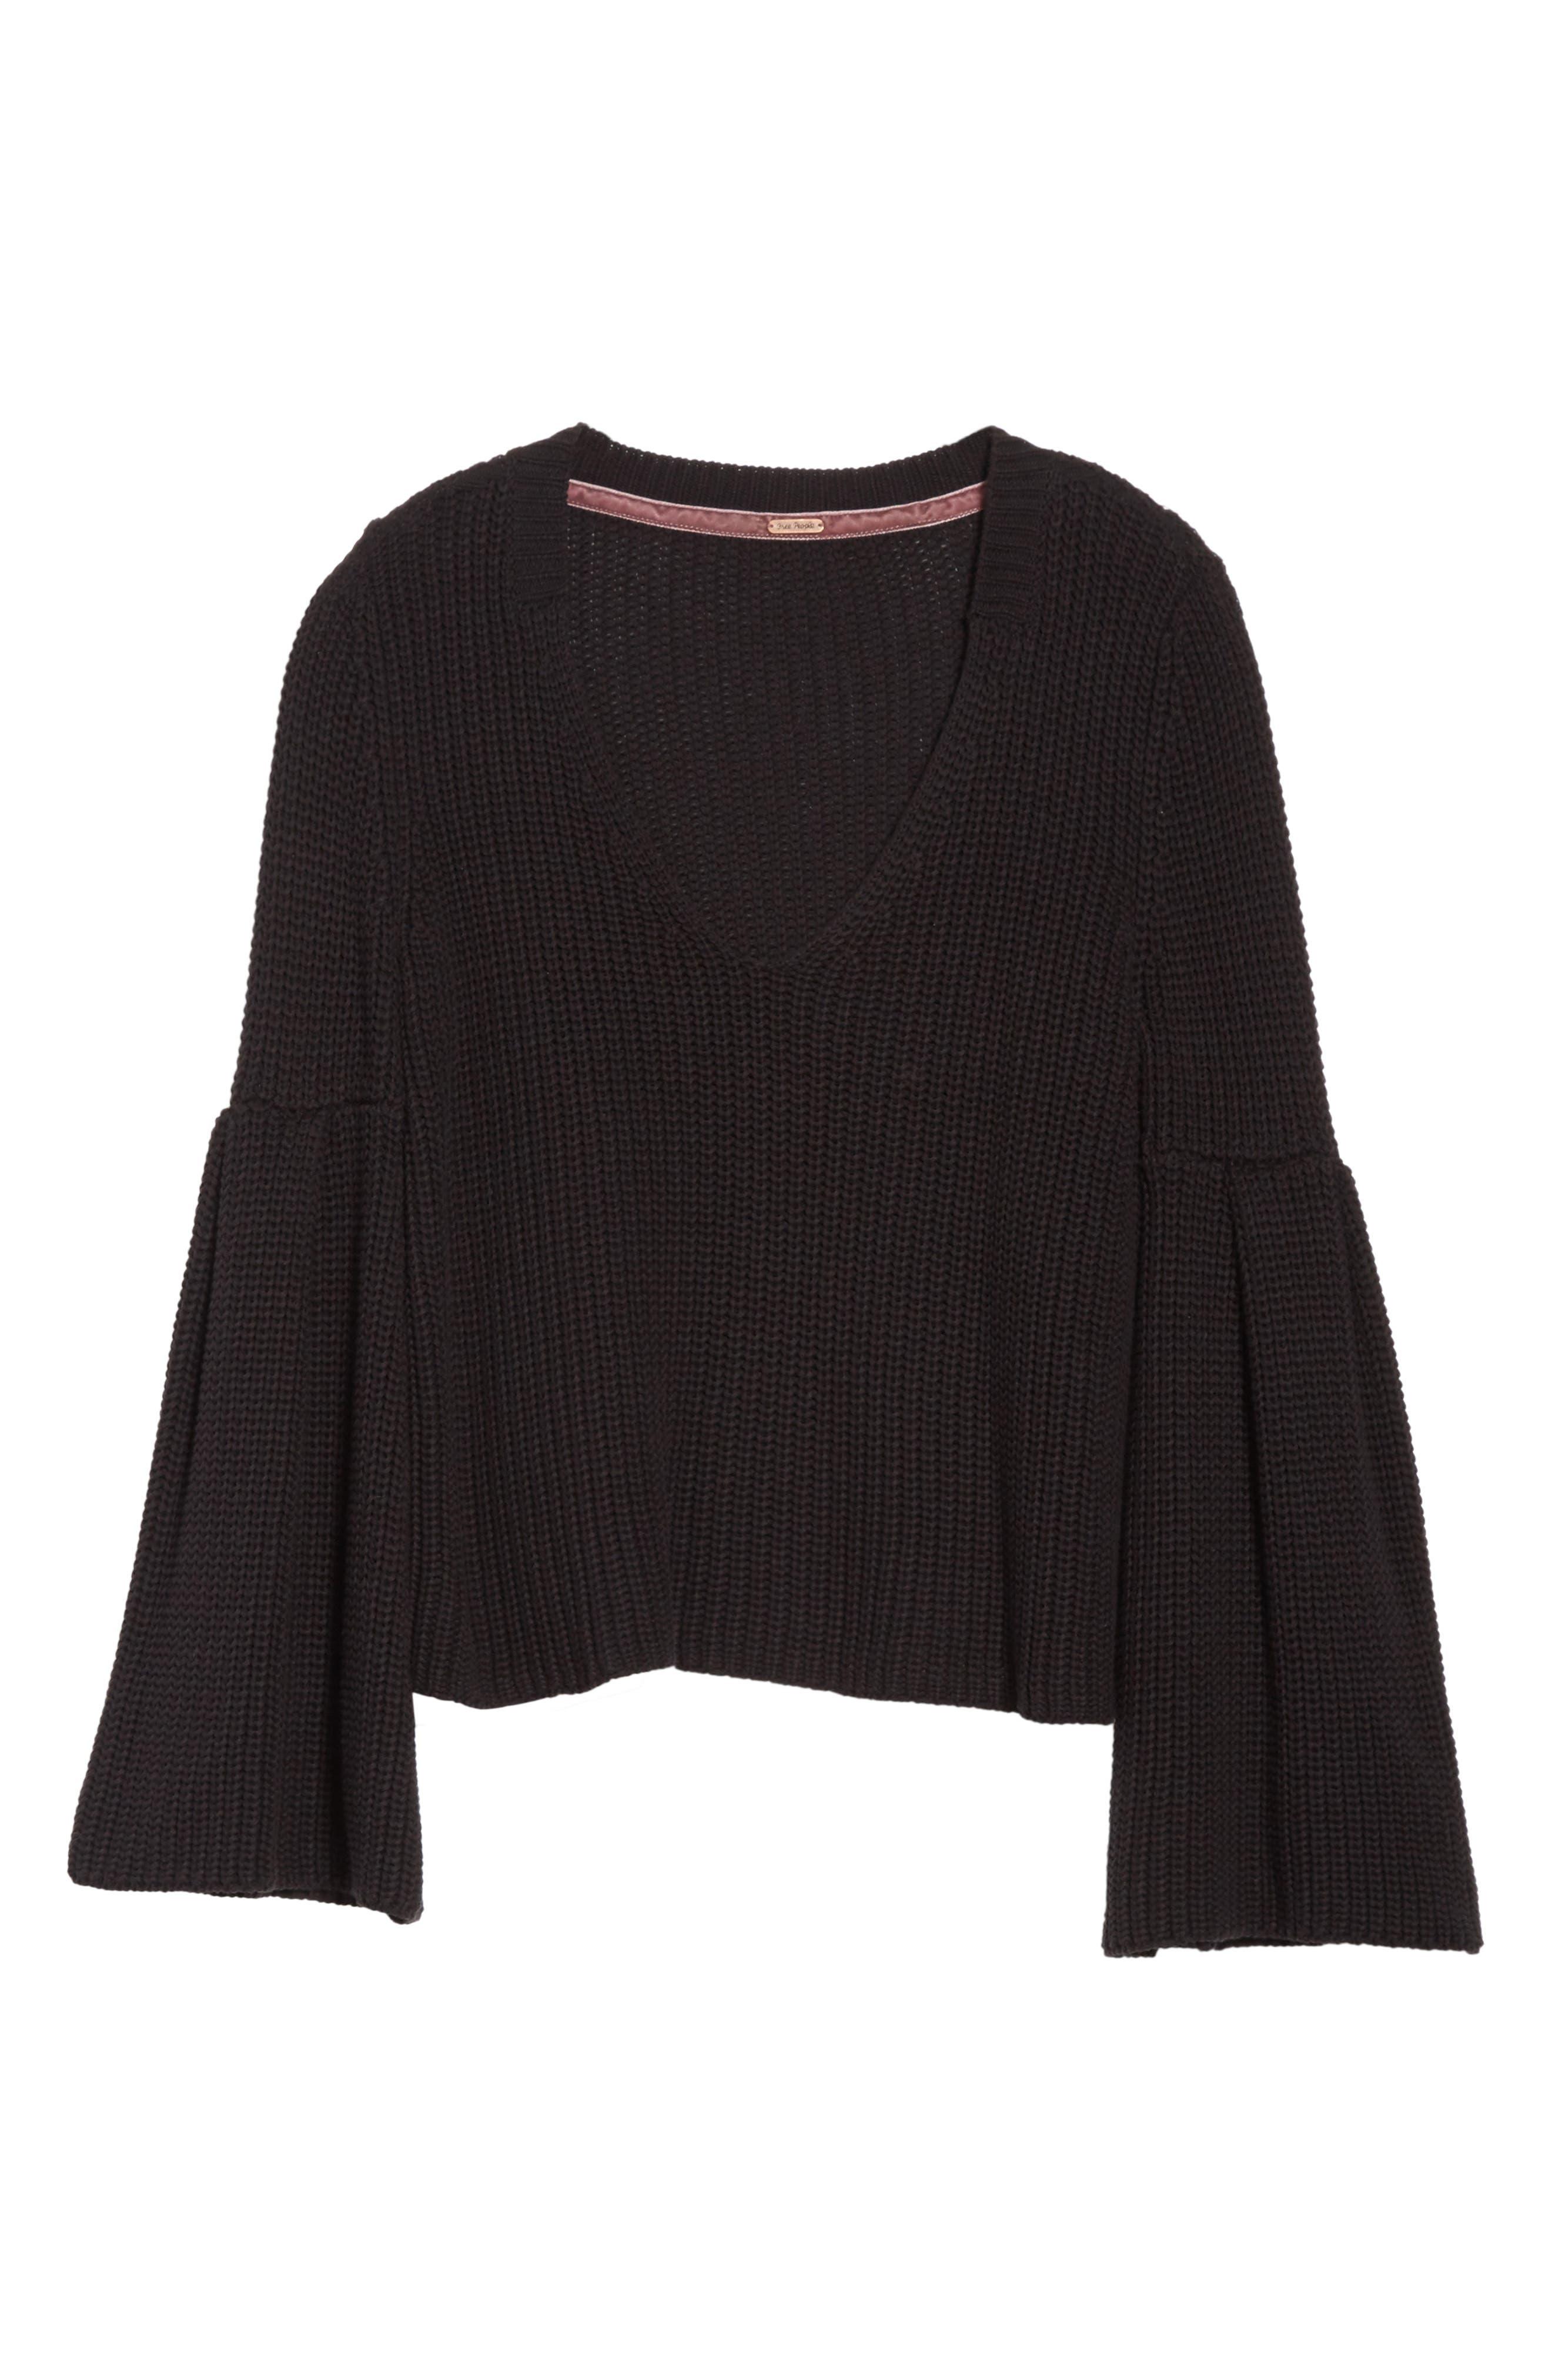 Damsel Bell Sleeve Pullover,                             Alternate thumbnail 6, color,                             001